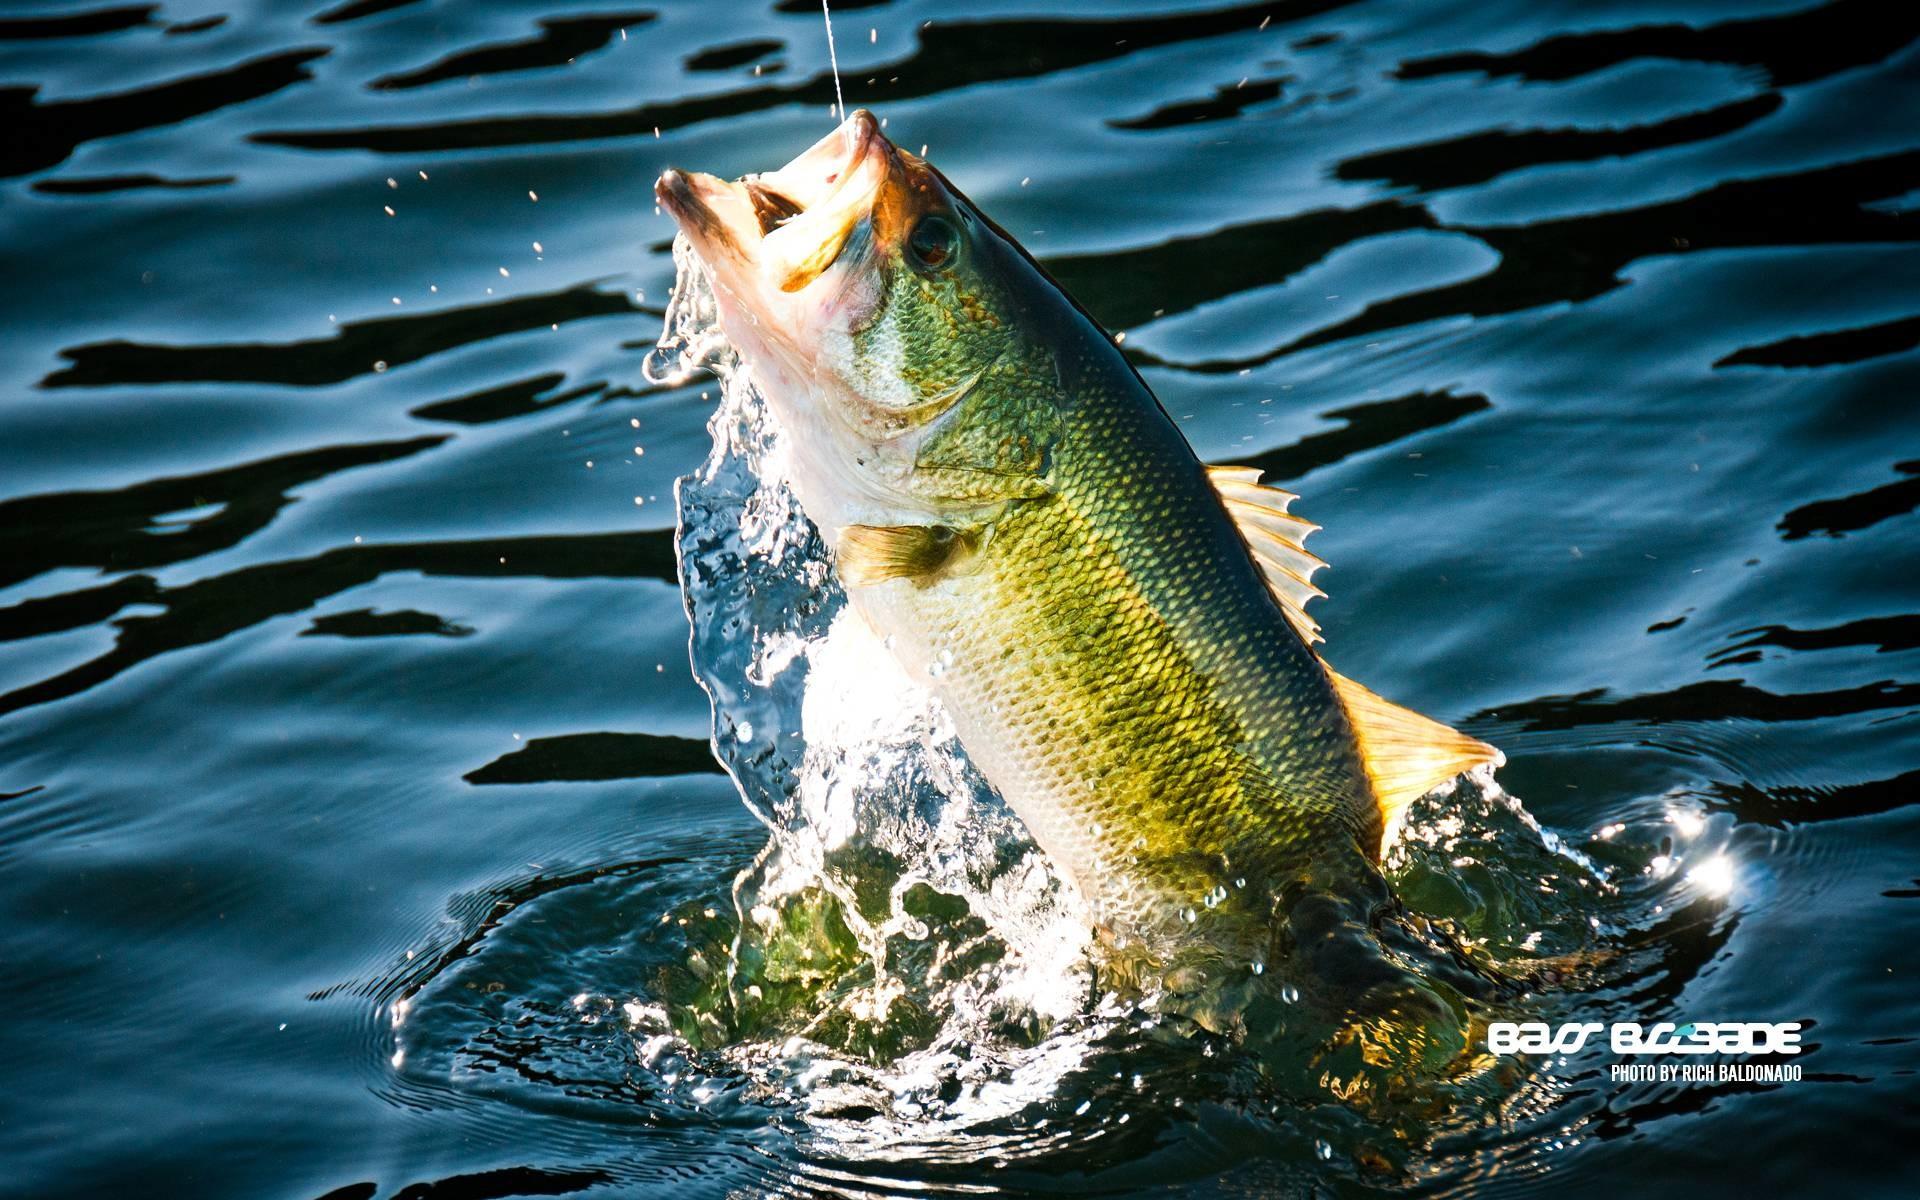 Bass Fishing Wallpaper HD 63 images